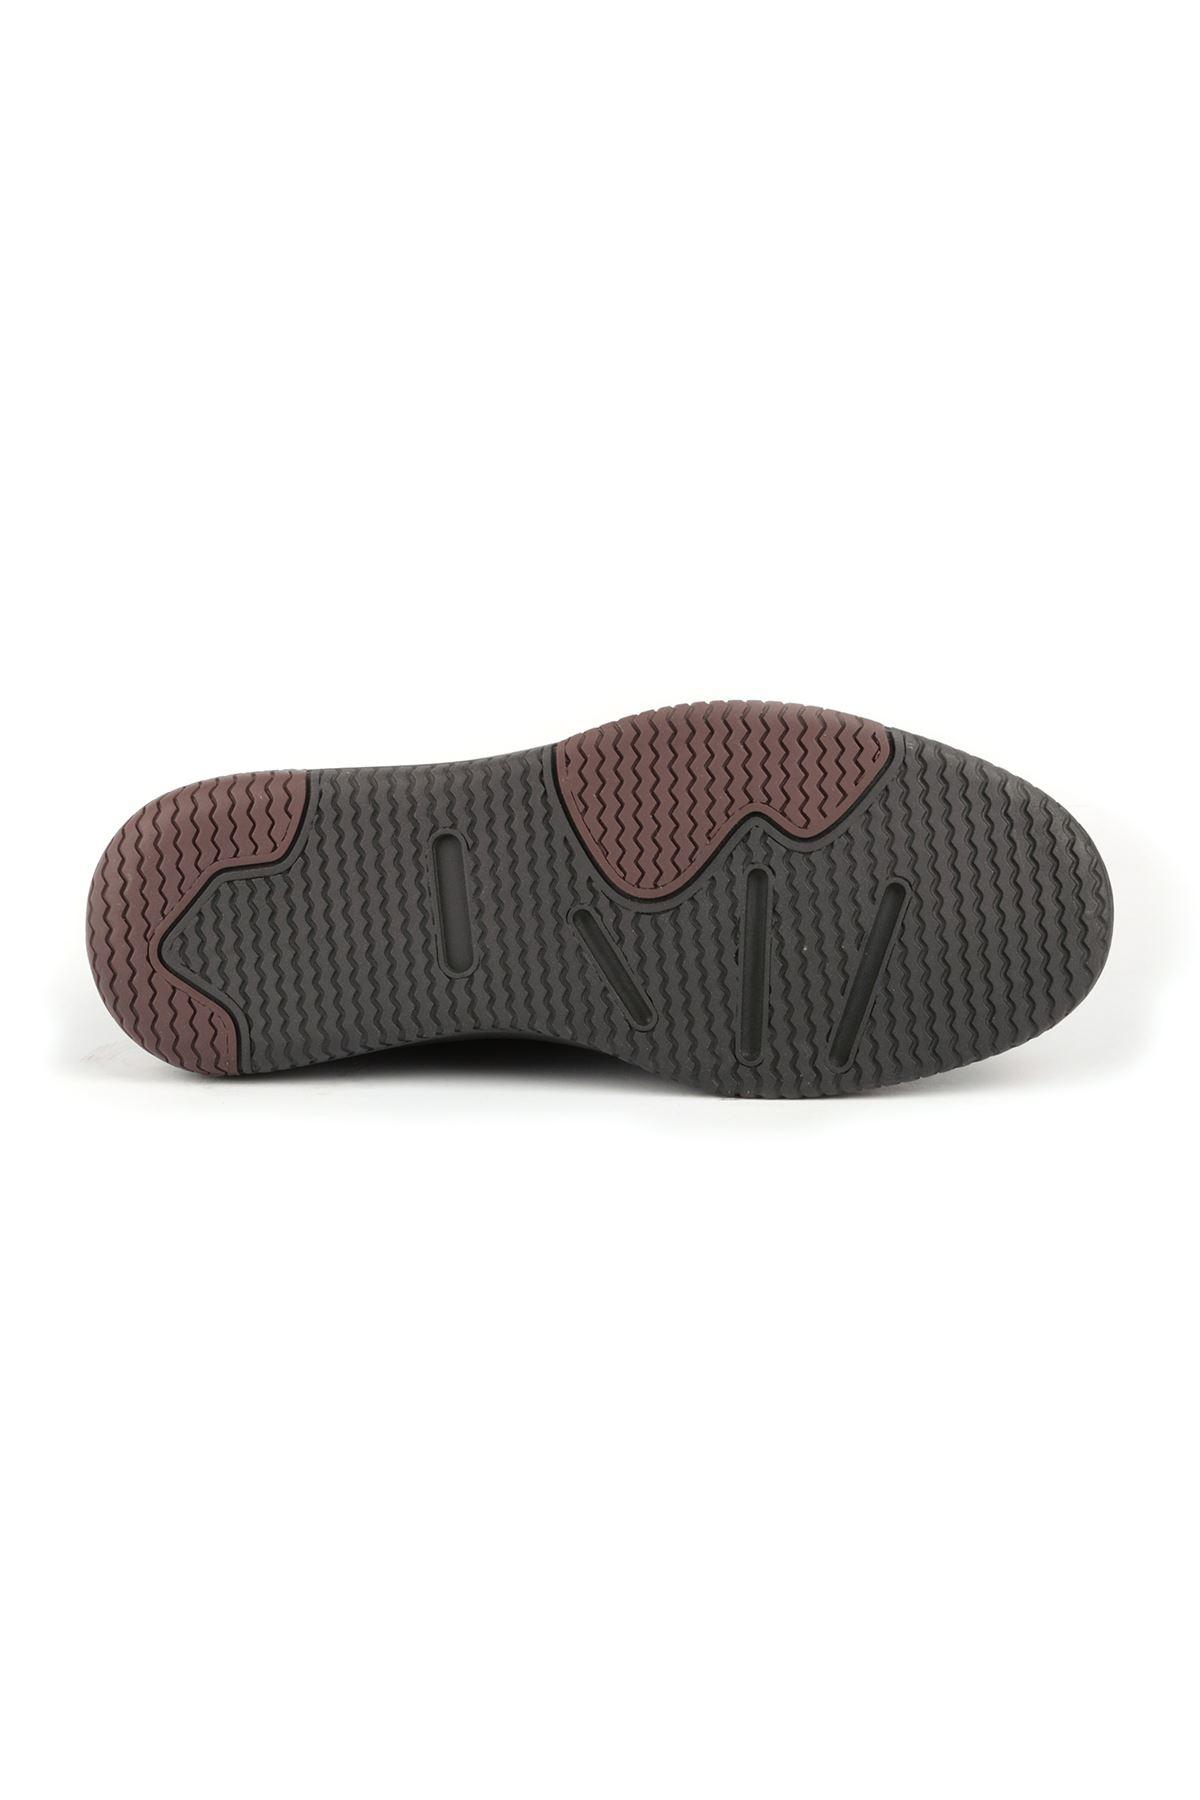 Libero L3546 Lacivert Spor Ayakkabı